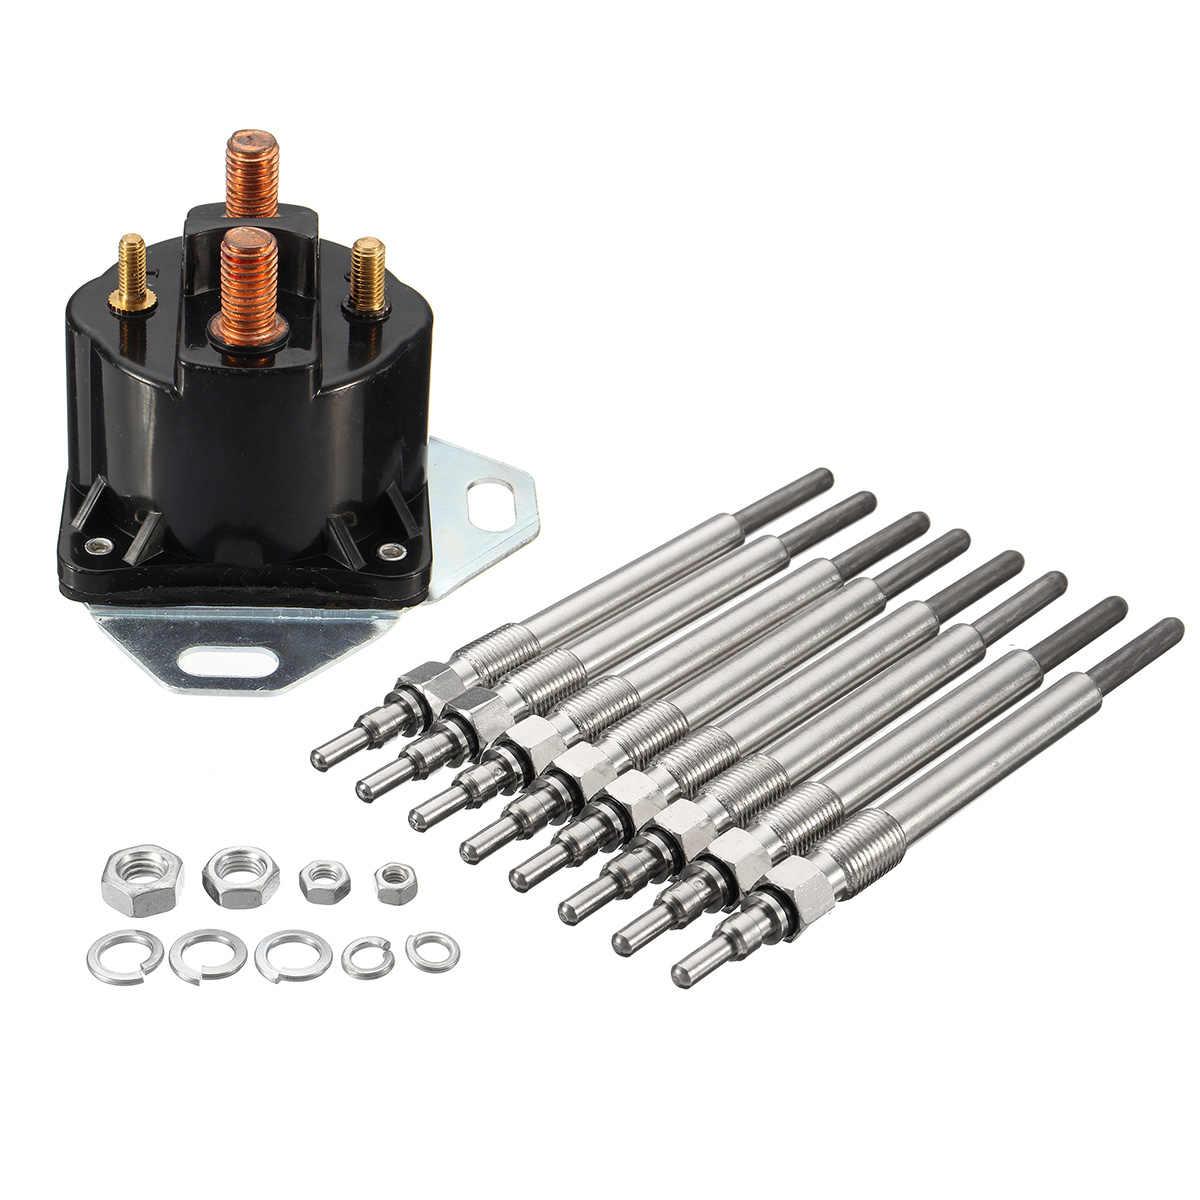 9pcs 7 3l car powerstroke for diesel glow for spark plug glowplug relay solenoid heater plug [ 1200 x 1200 Pixel ]